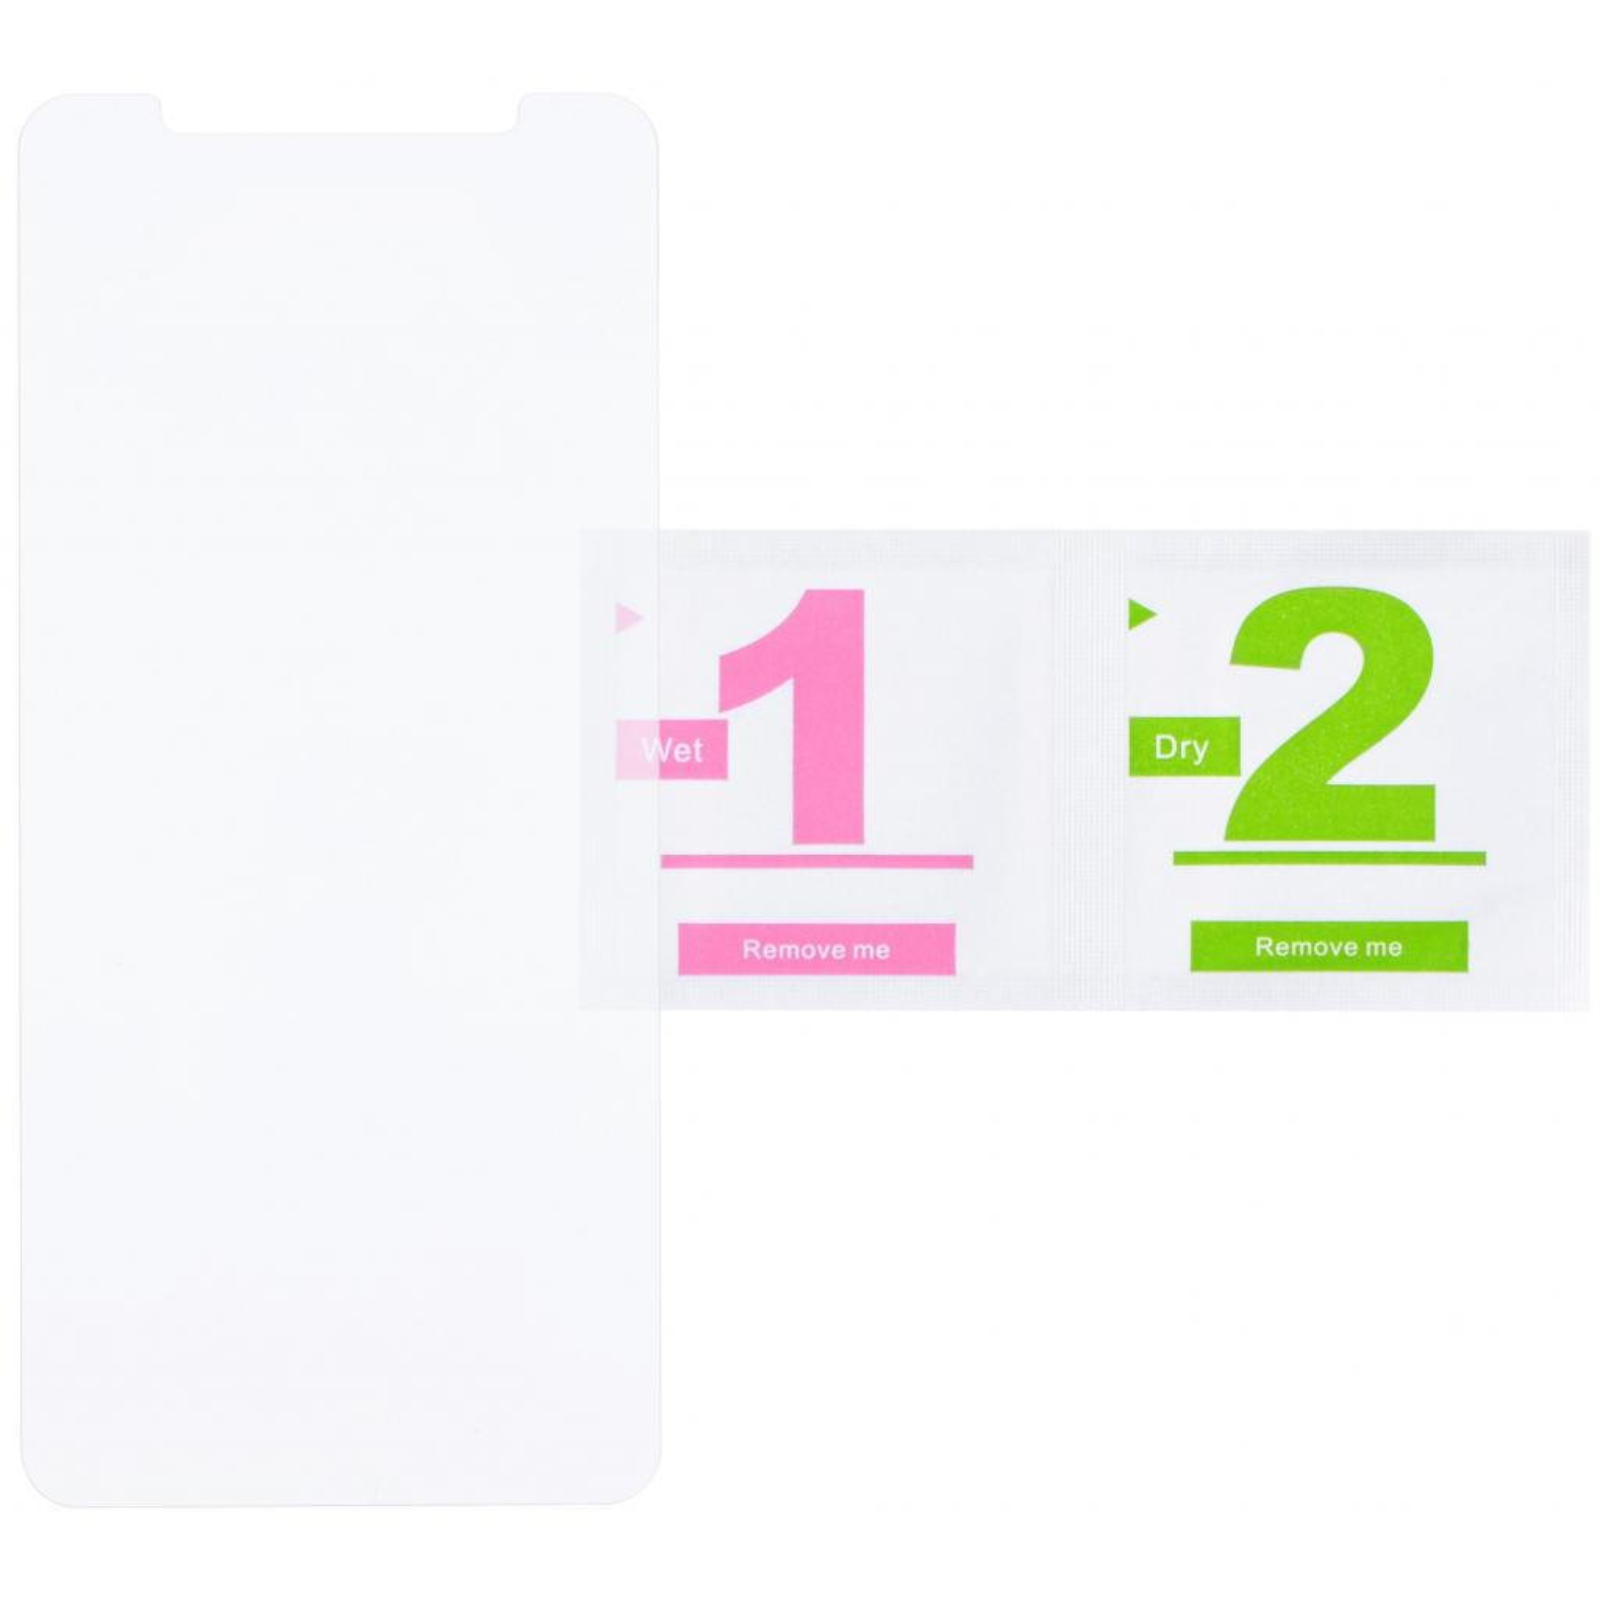 Стекло защитное 2E для Huawei Y6 2018 2.5D Clear (2E-TGHW-Y618-25D) изображение 2